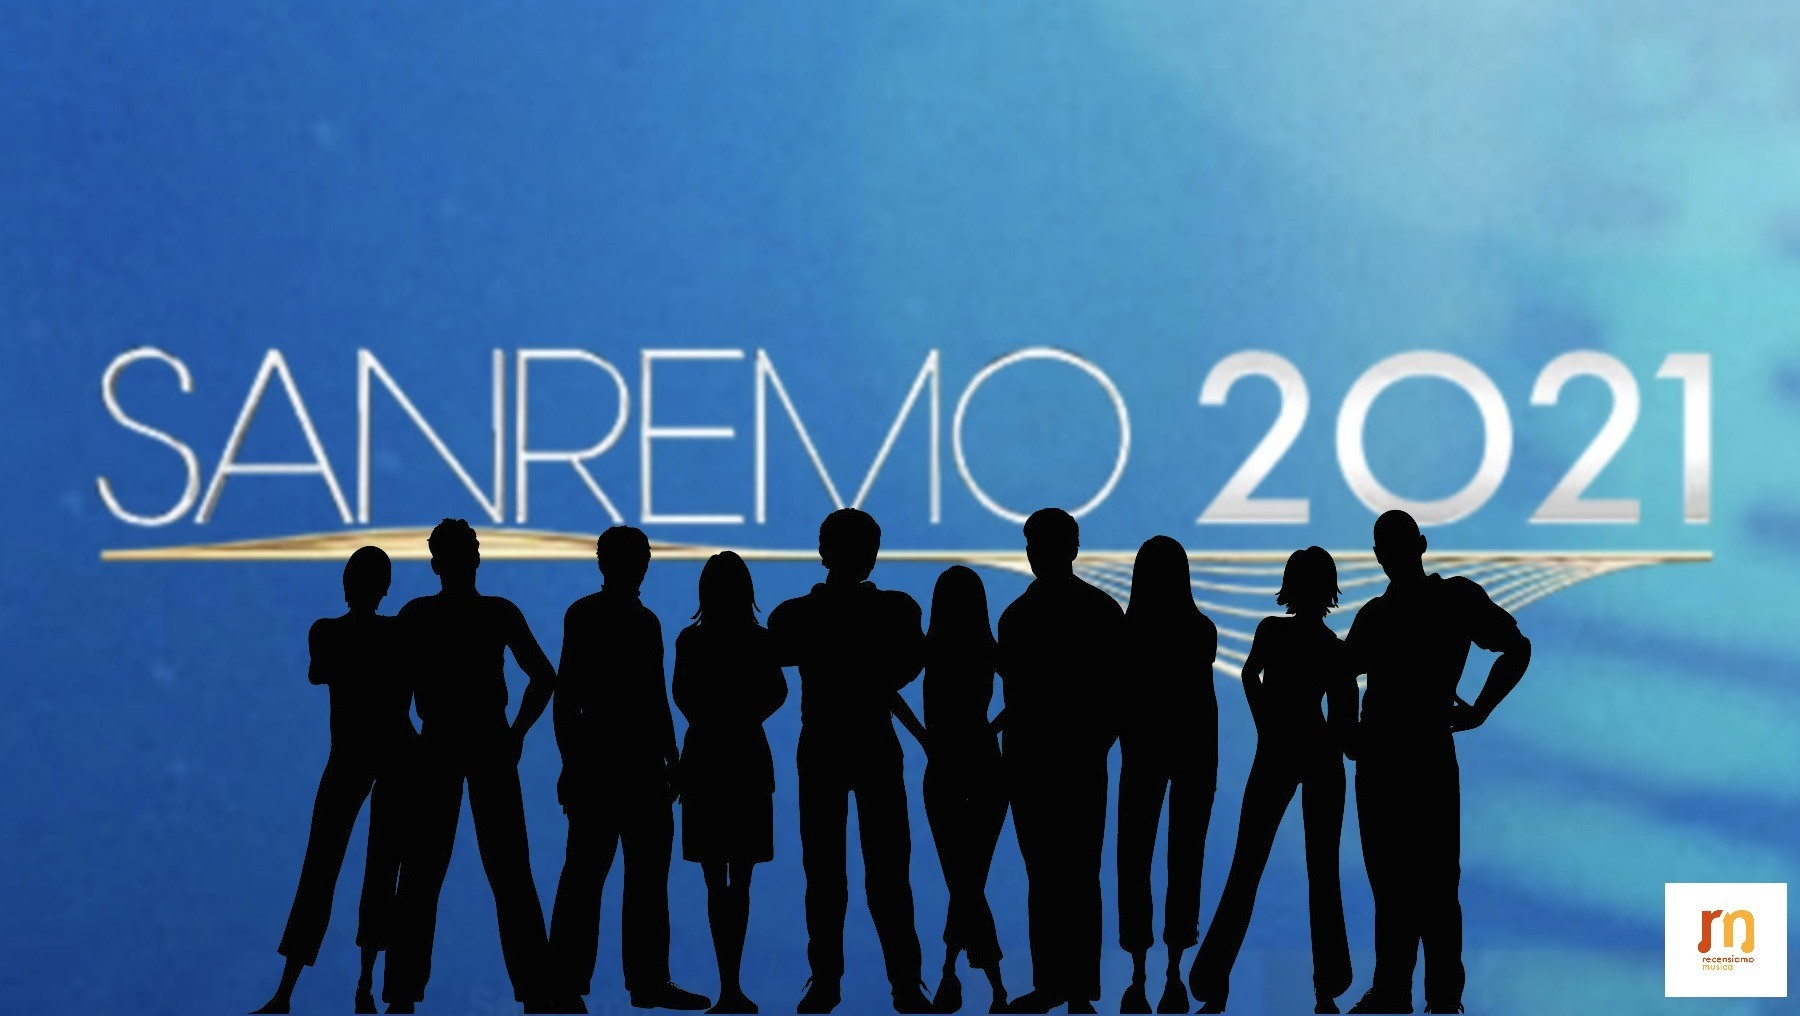 Sanremo 2021 cast